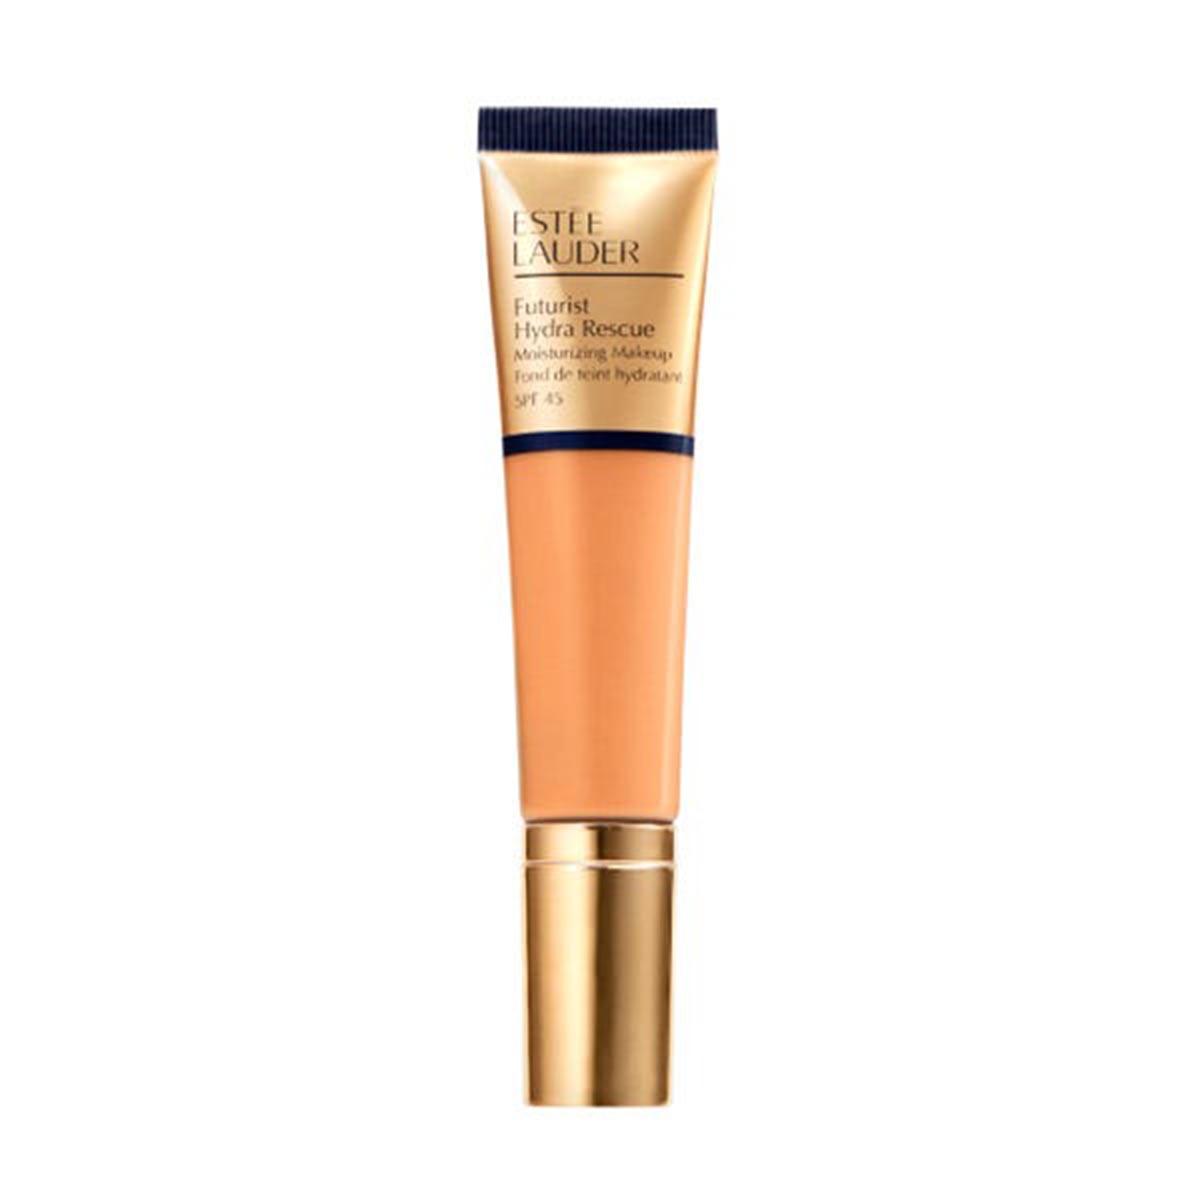 Estee lauder futurist hydra rescue mosturizing makeup spf45 4w1 honey bronze - BellezaMagica.com